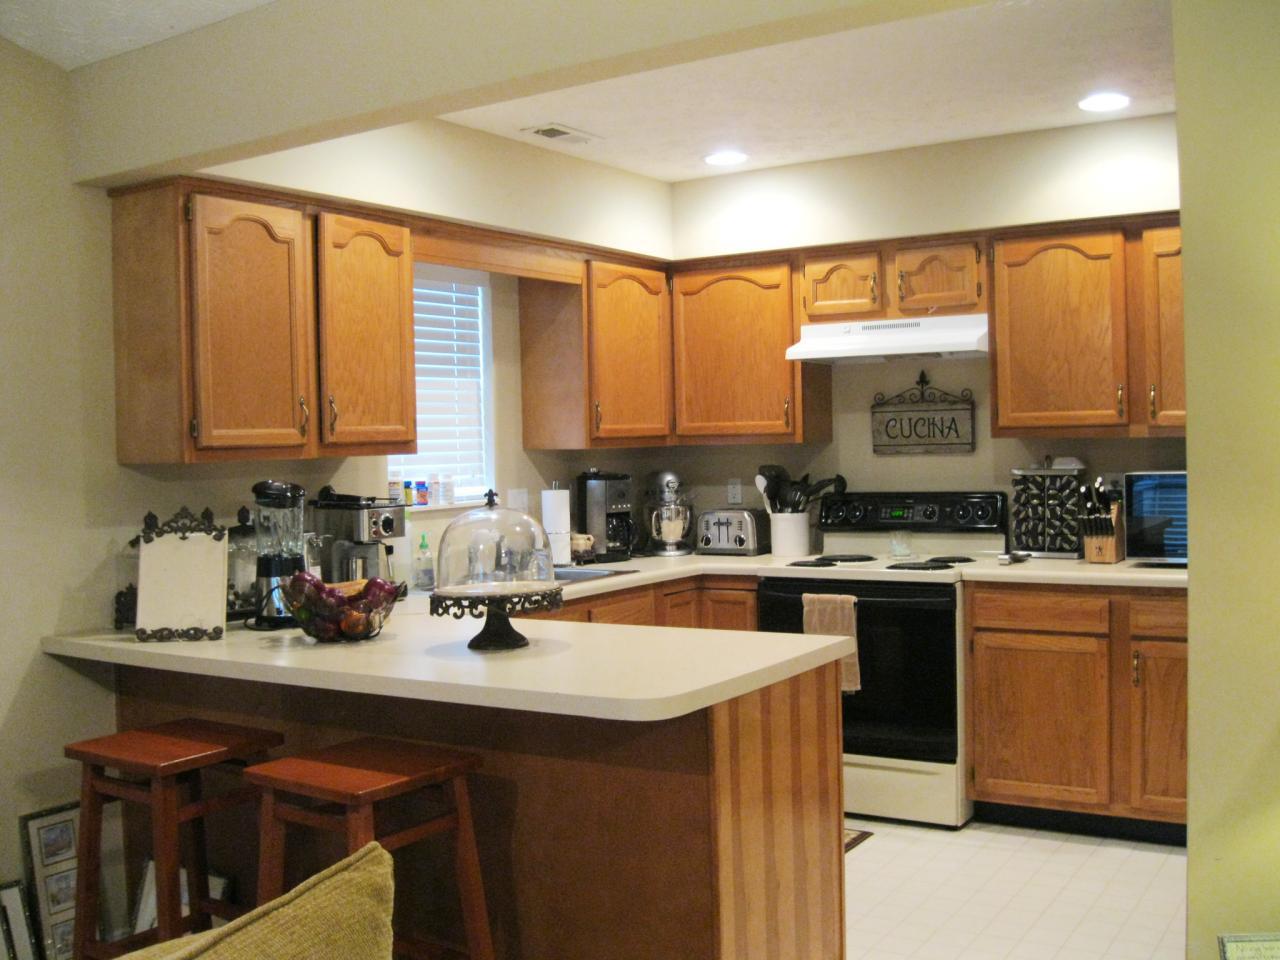 kitchen design ideas for older homes photo - 6